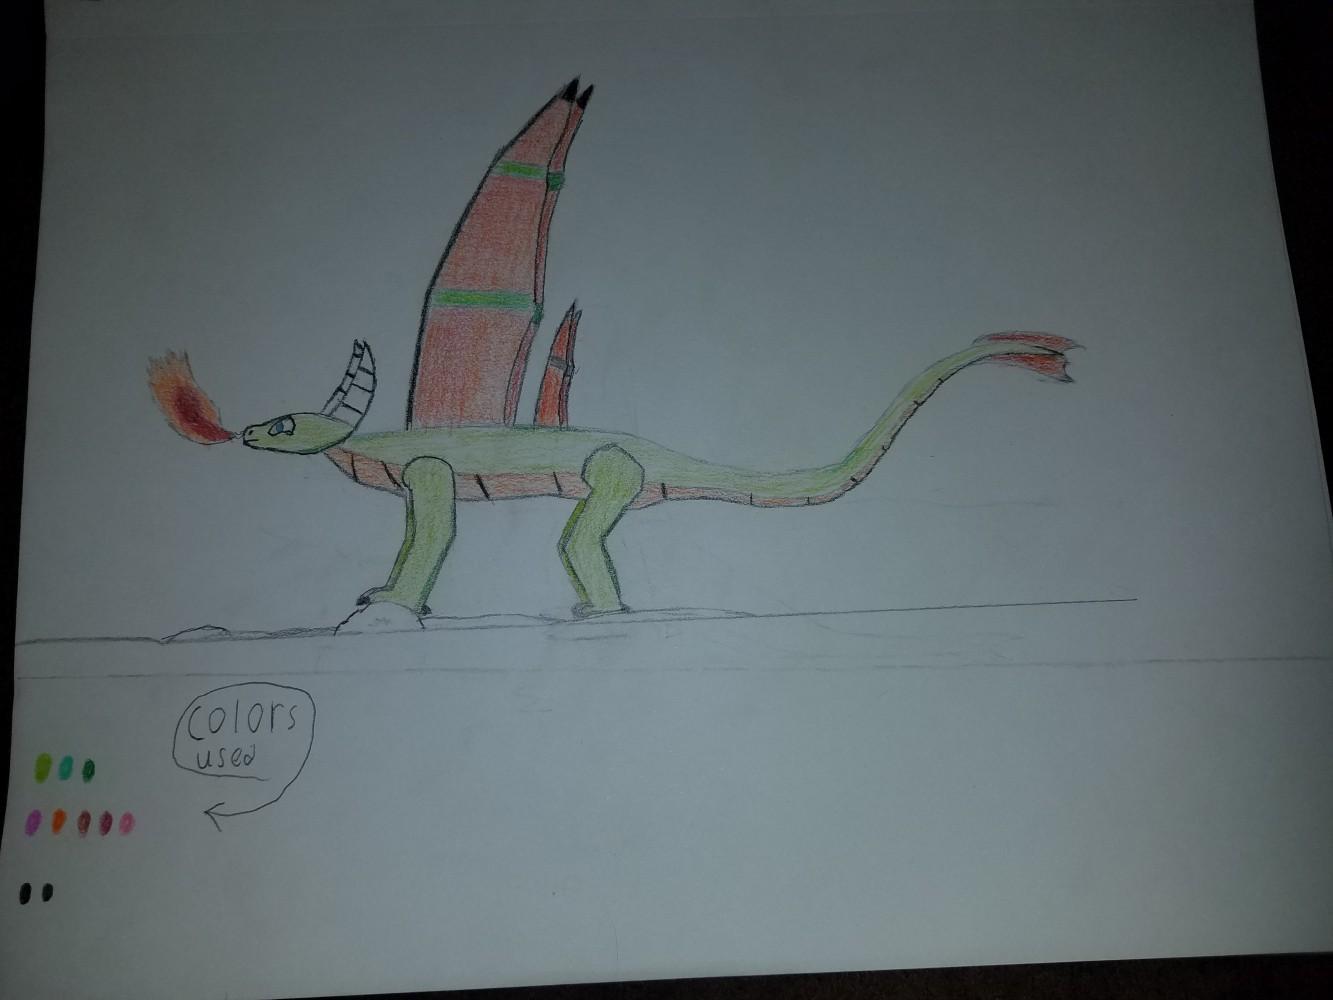 Rudder the dragon by Manj10